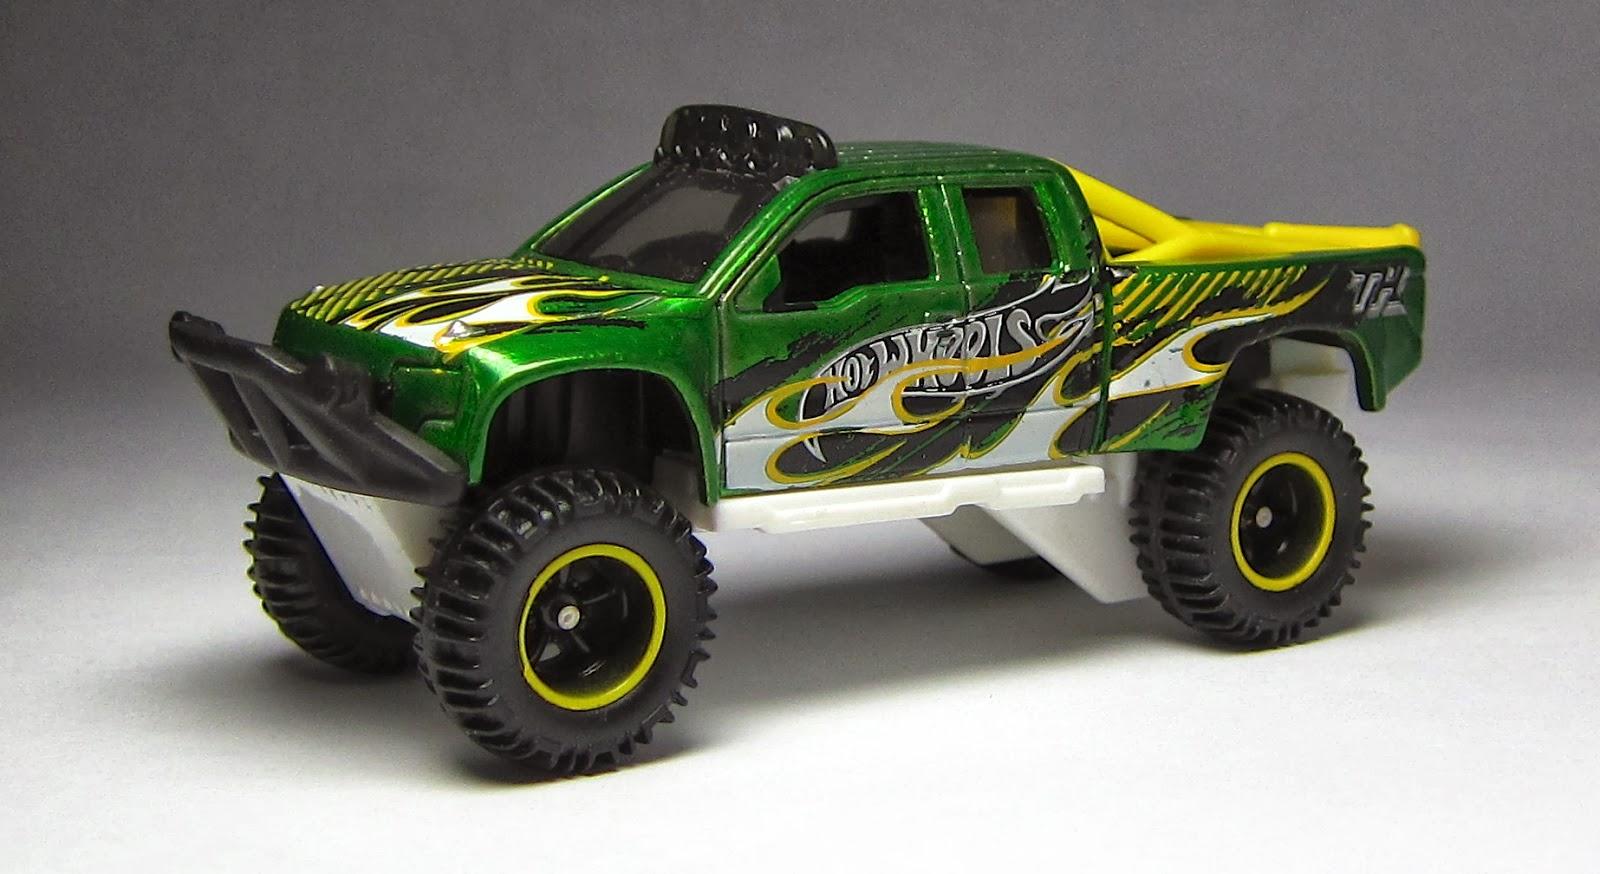 Hot Wheels Sandblaster (2014 Super Treasure Hunt):